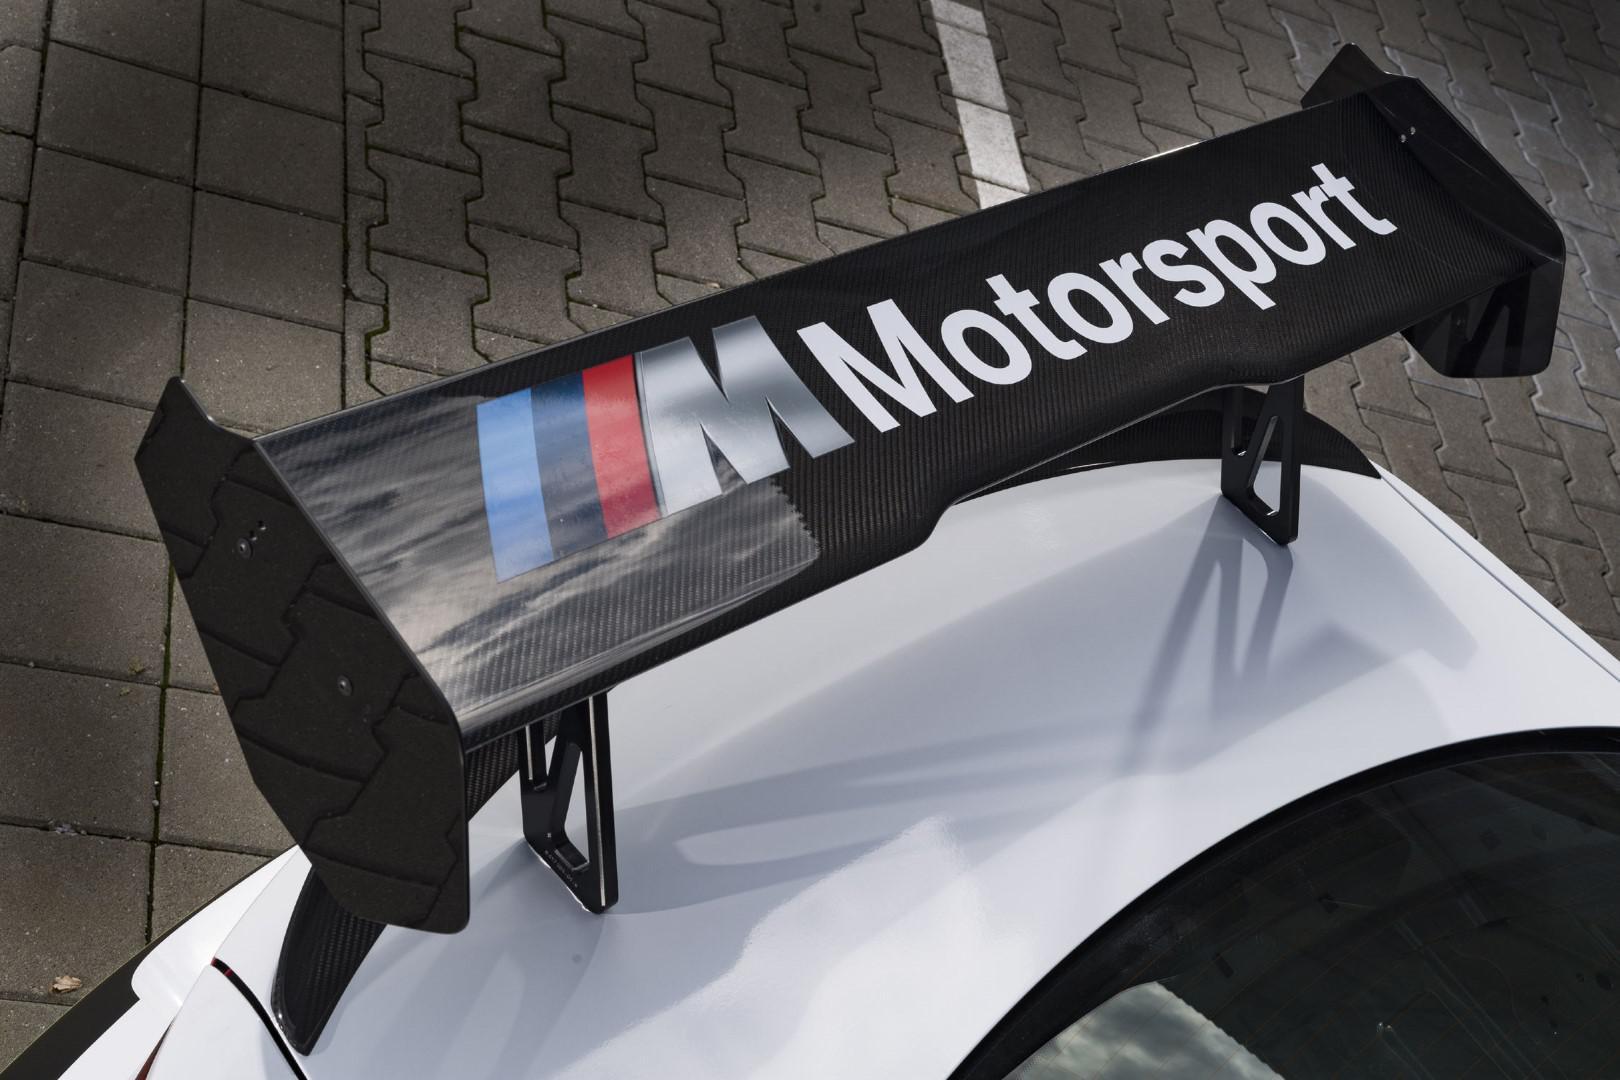 bmw-m235i-racing-cup-pack-evo-877-3.jpg